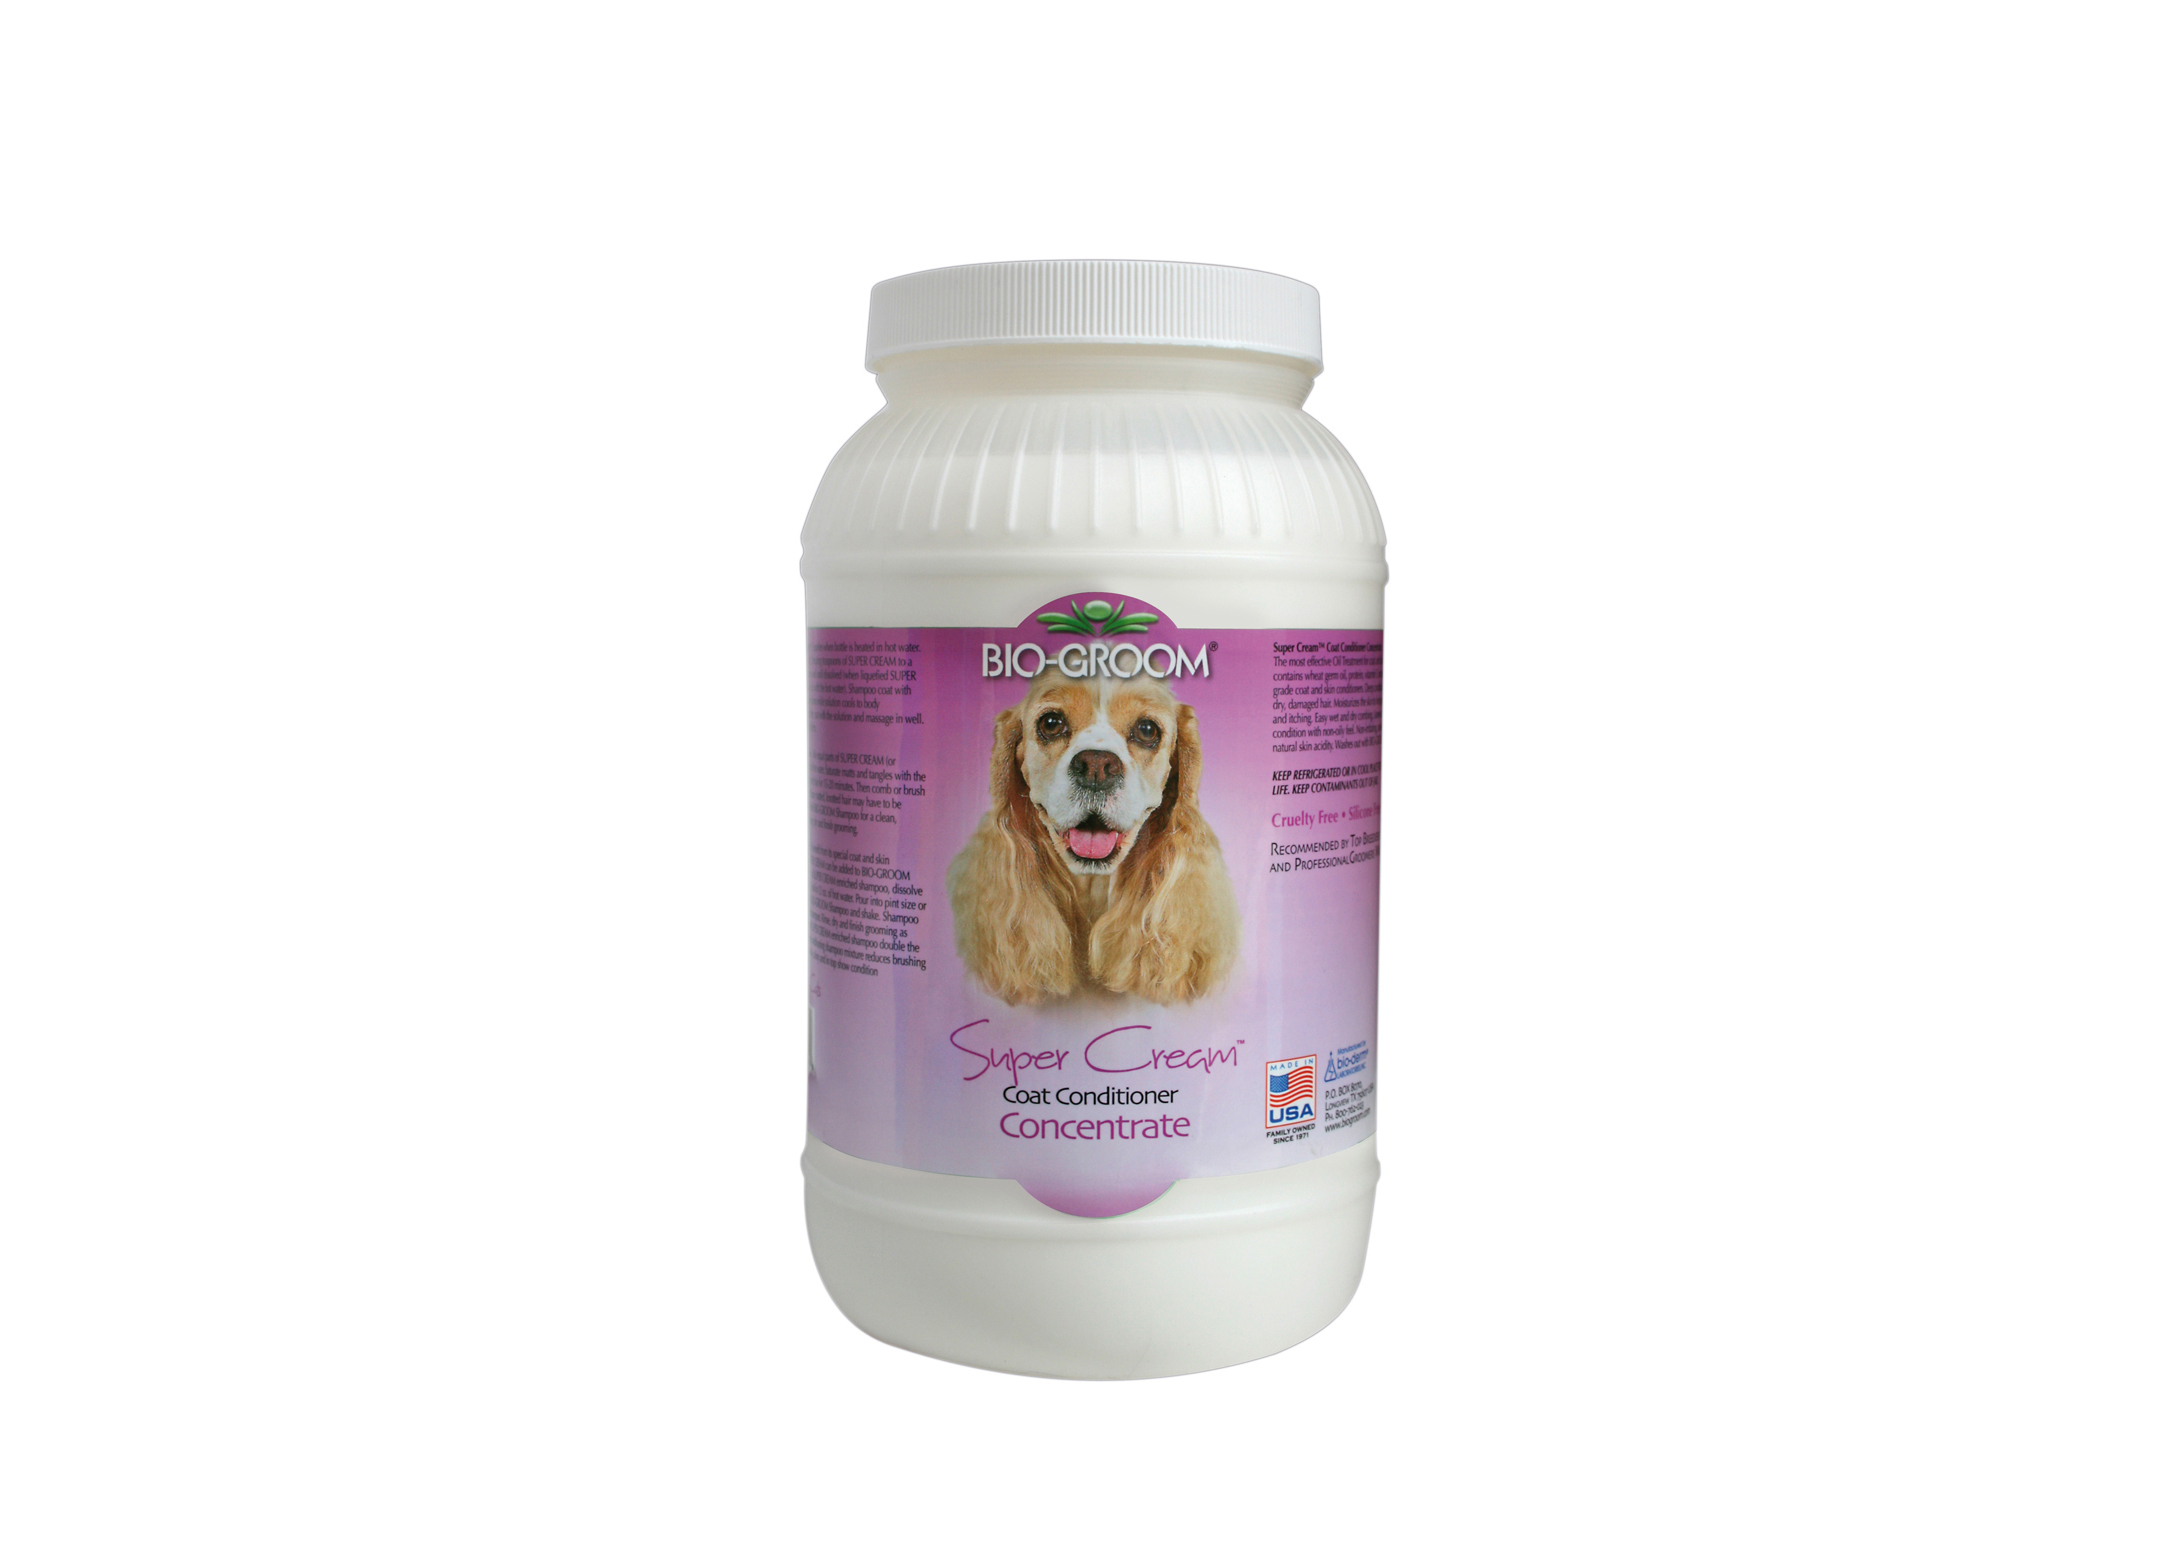 Bio Groom Super Cream Conditioner For Dogs, Cats And Horses